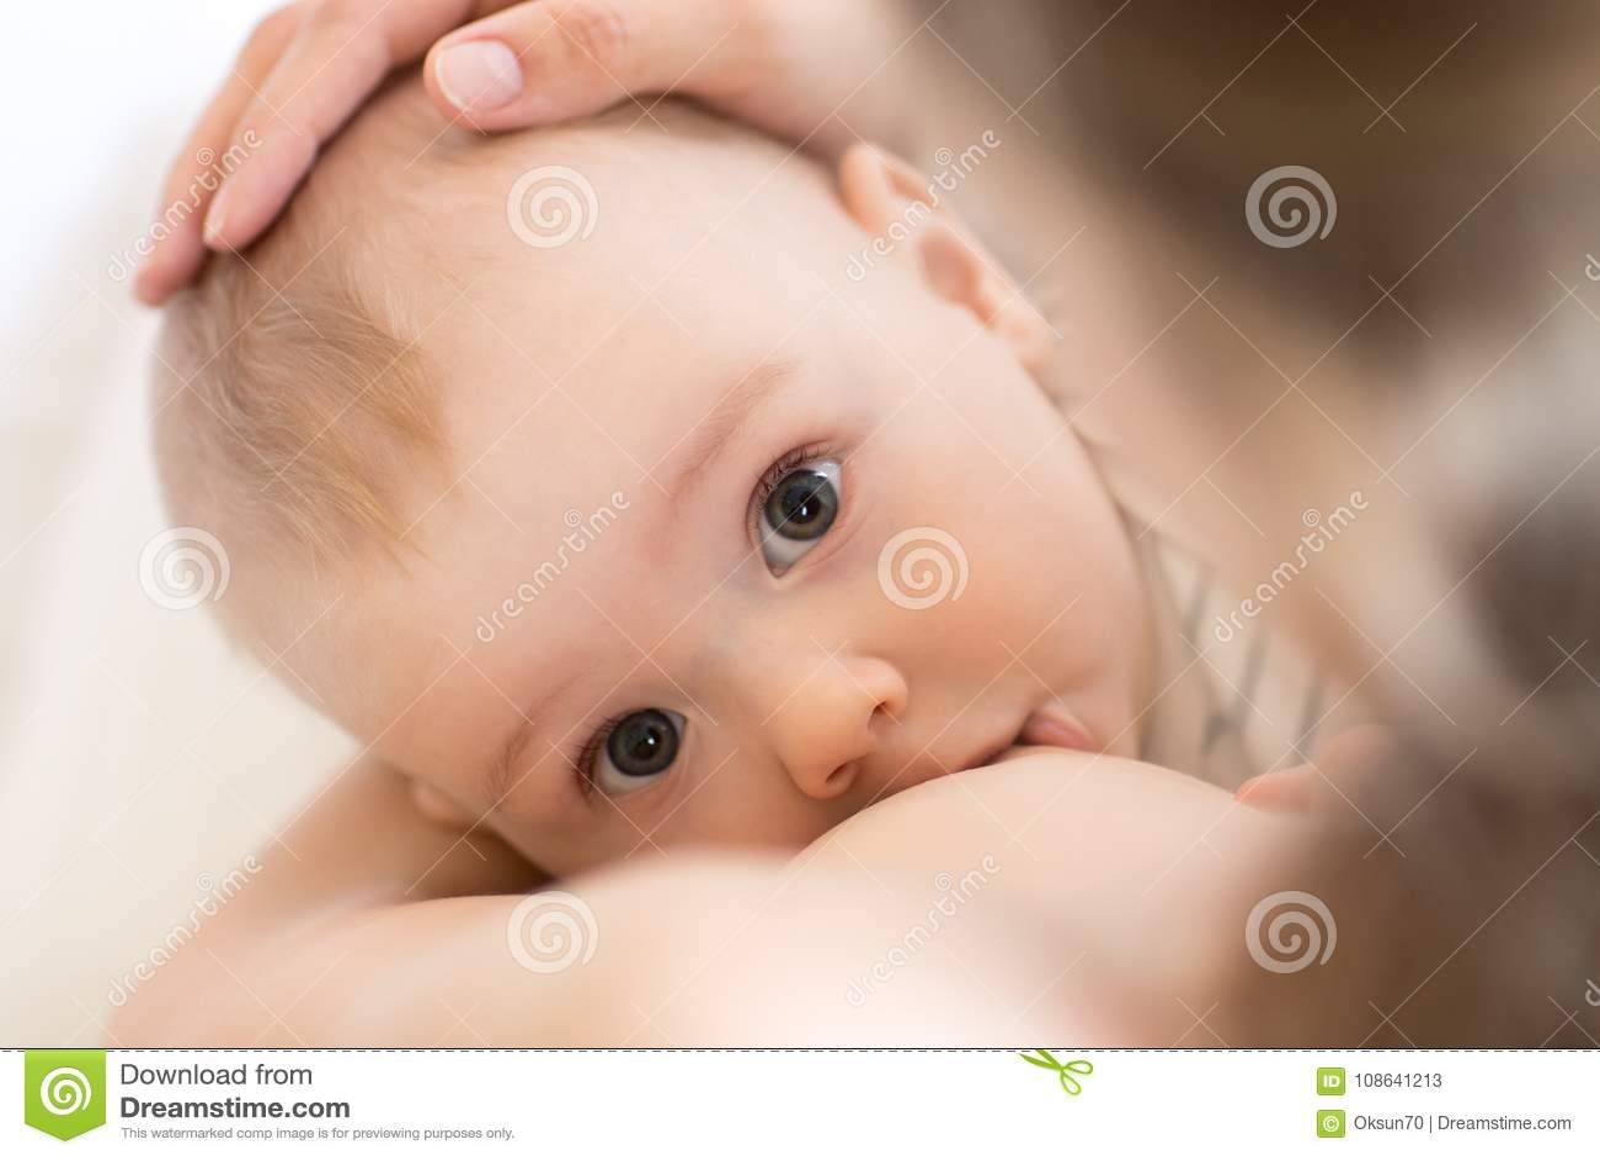 Mother breastfeeding her little boy. Mom nursing and feeding baby. Close-up portrait.